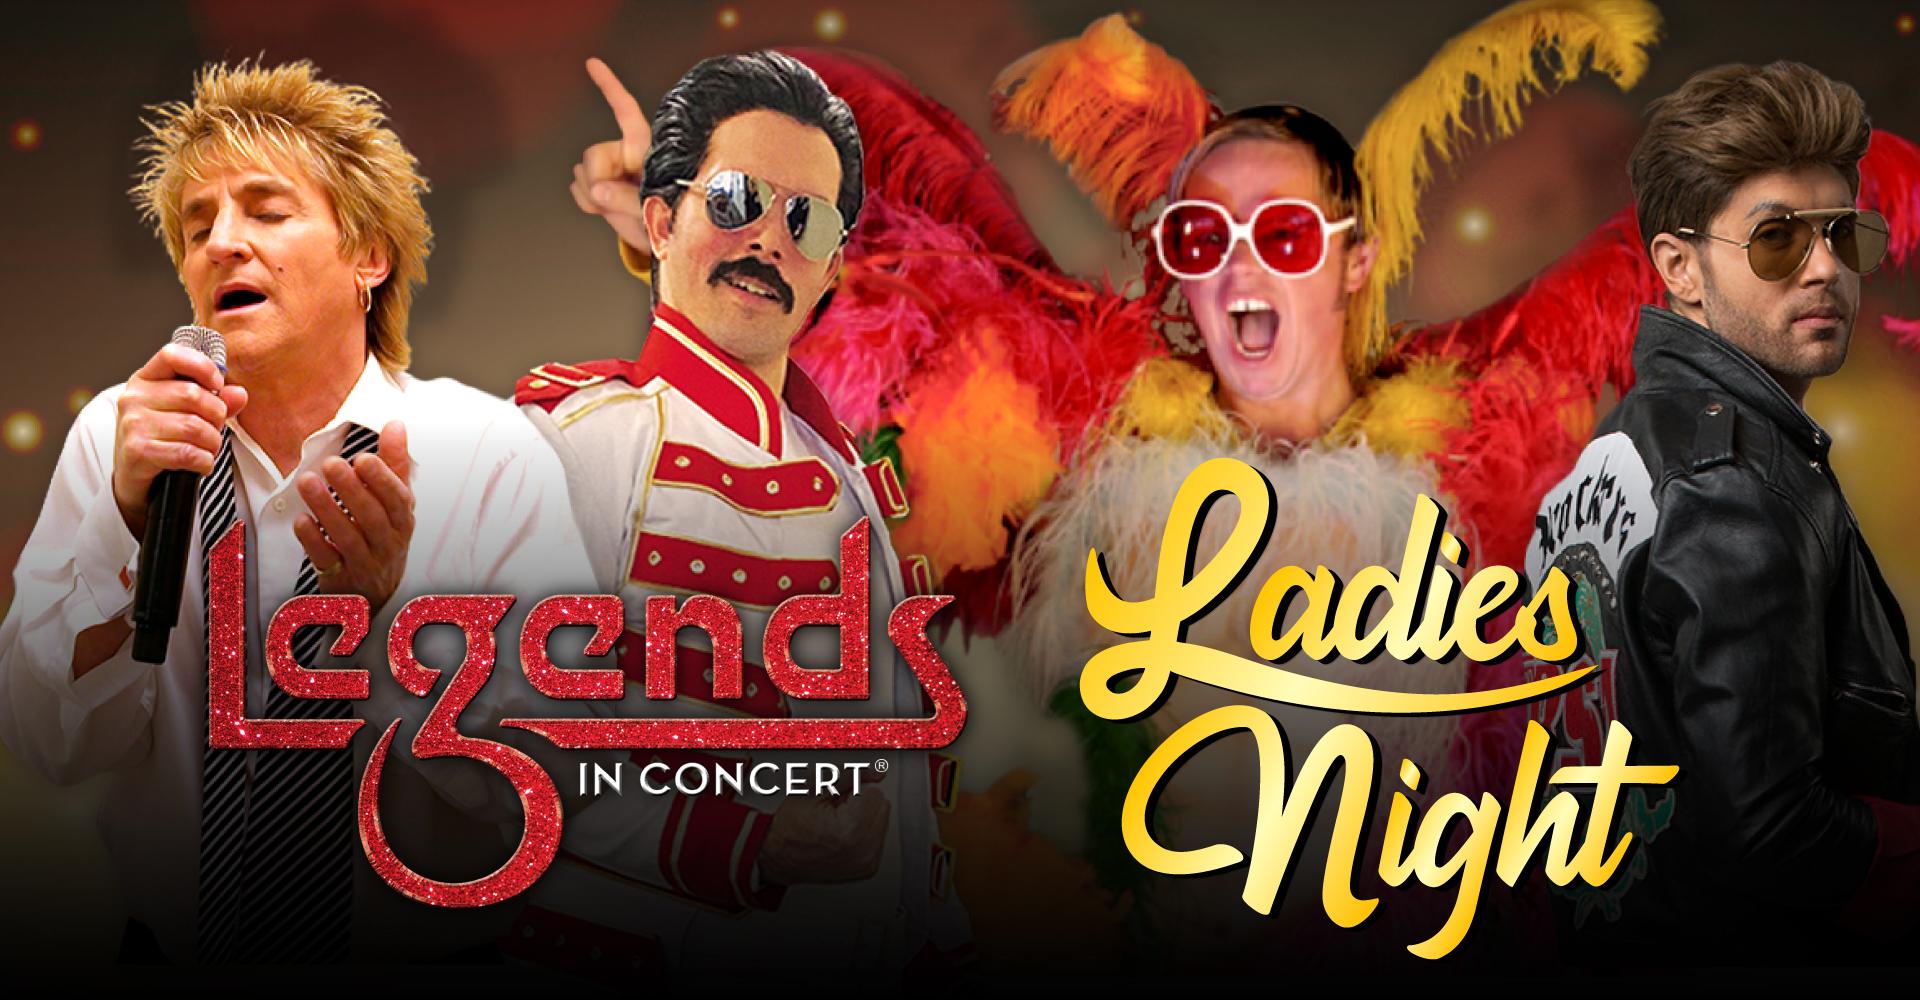 Legends in Concert - Ladies Night